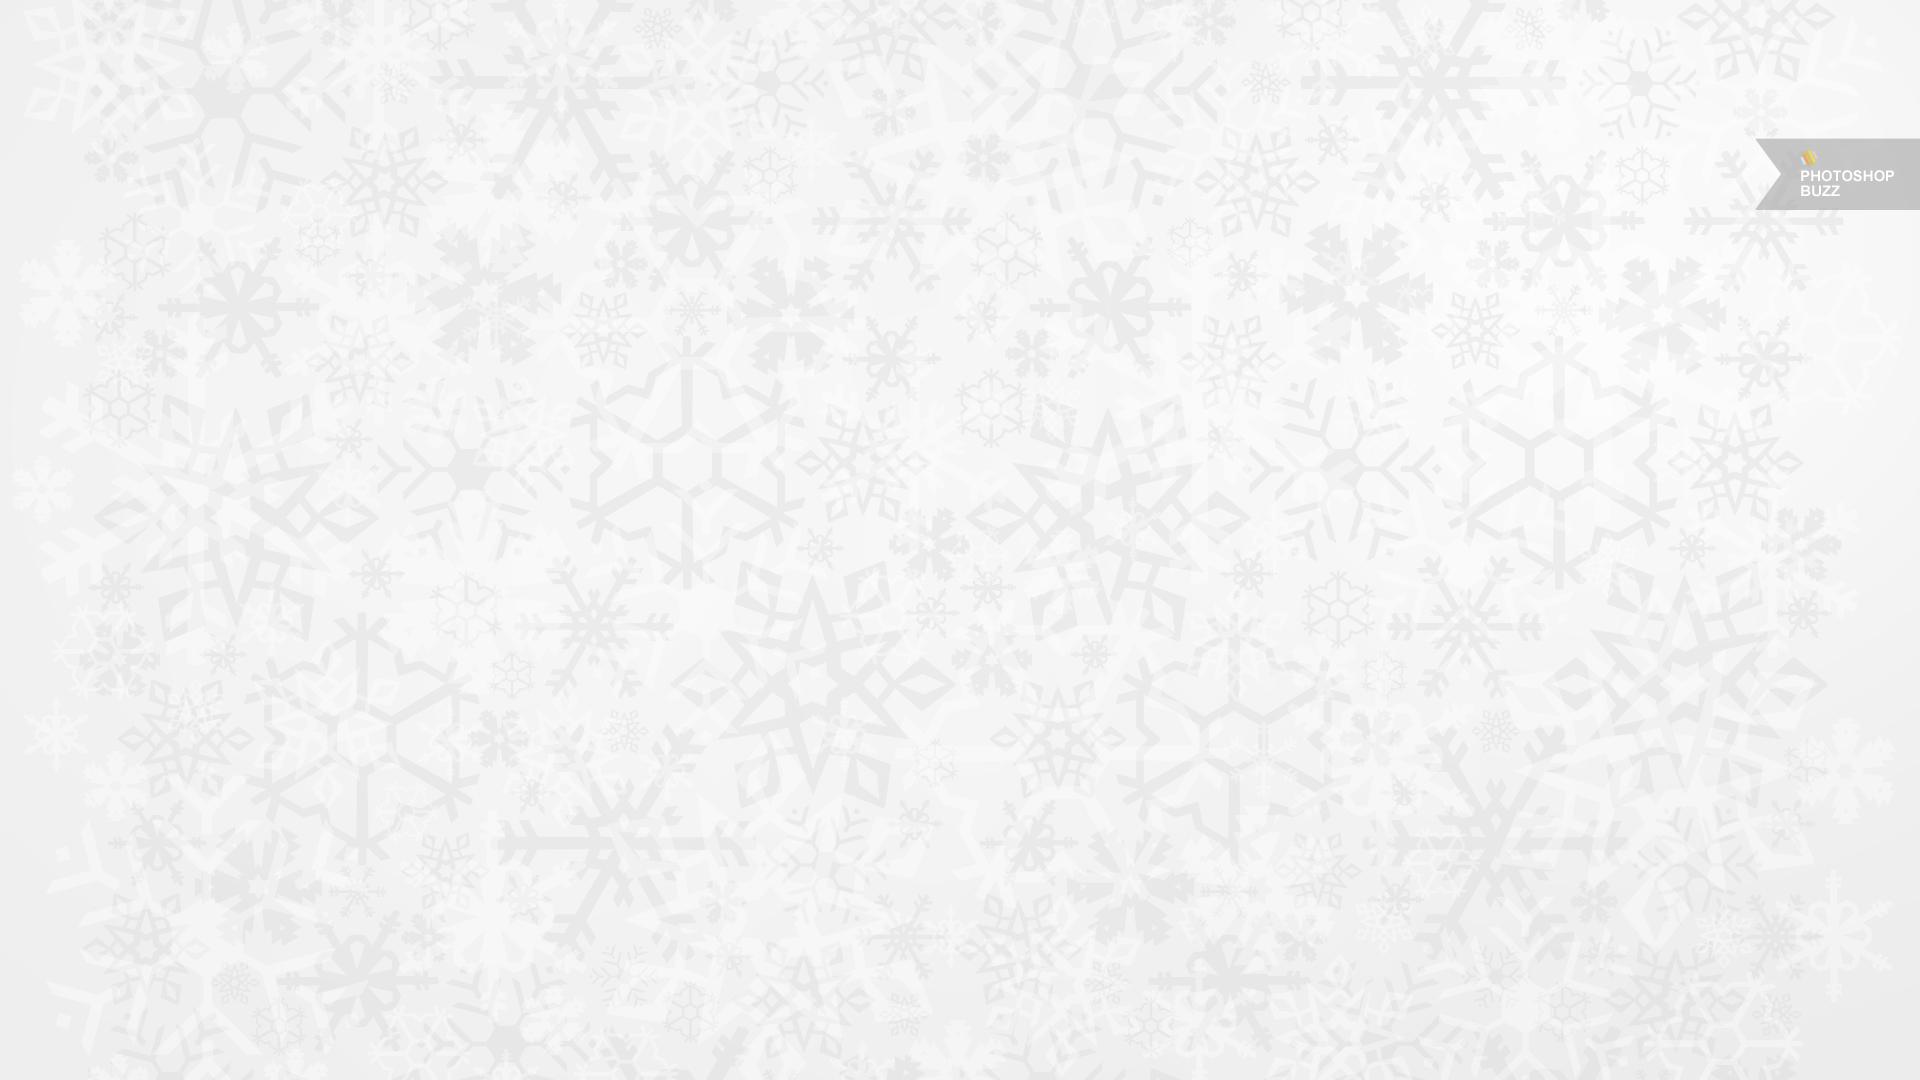 Cool Wallpaper Marble Calendar - 1920x1080nocaldec11  You Should Have_51875.jpg